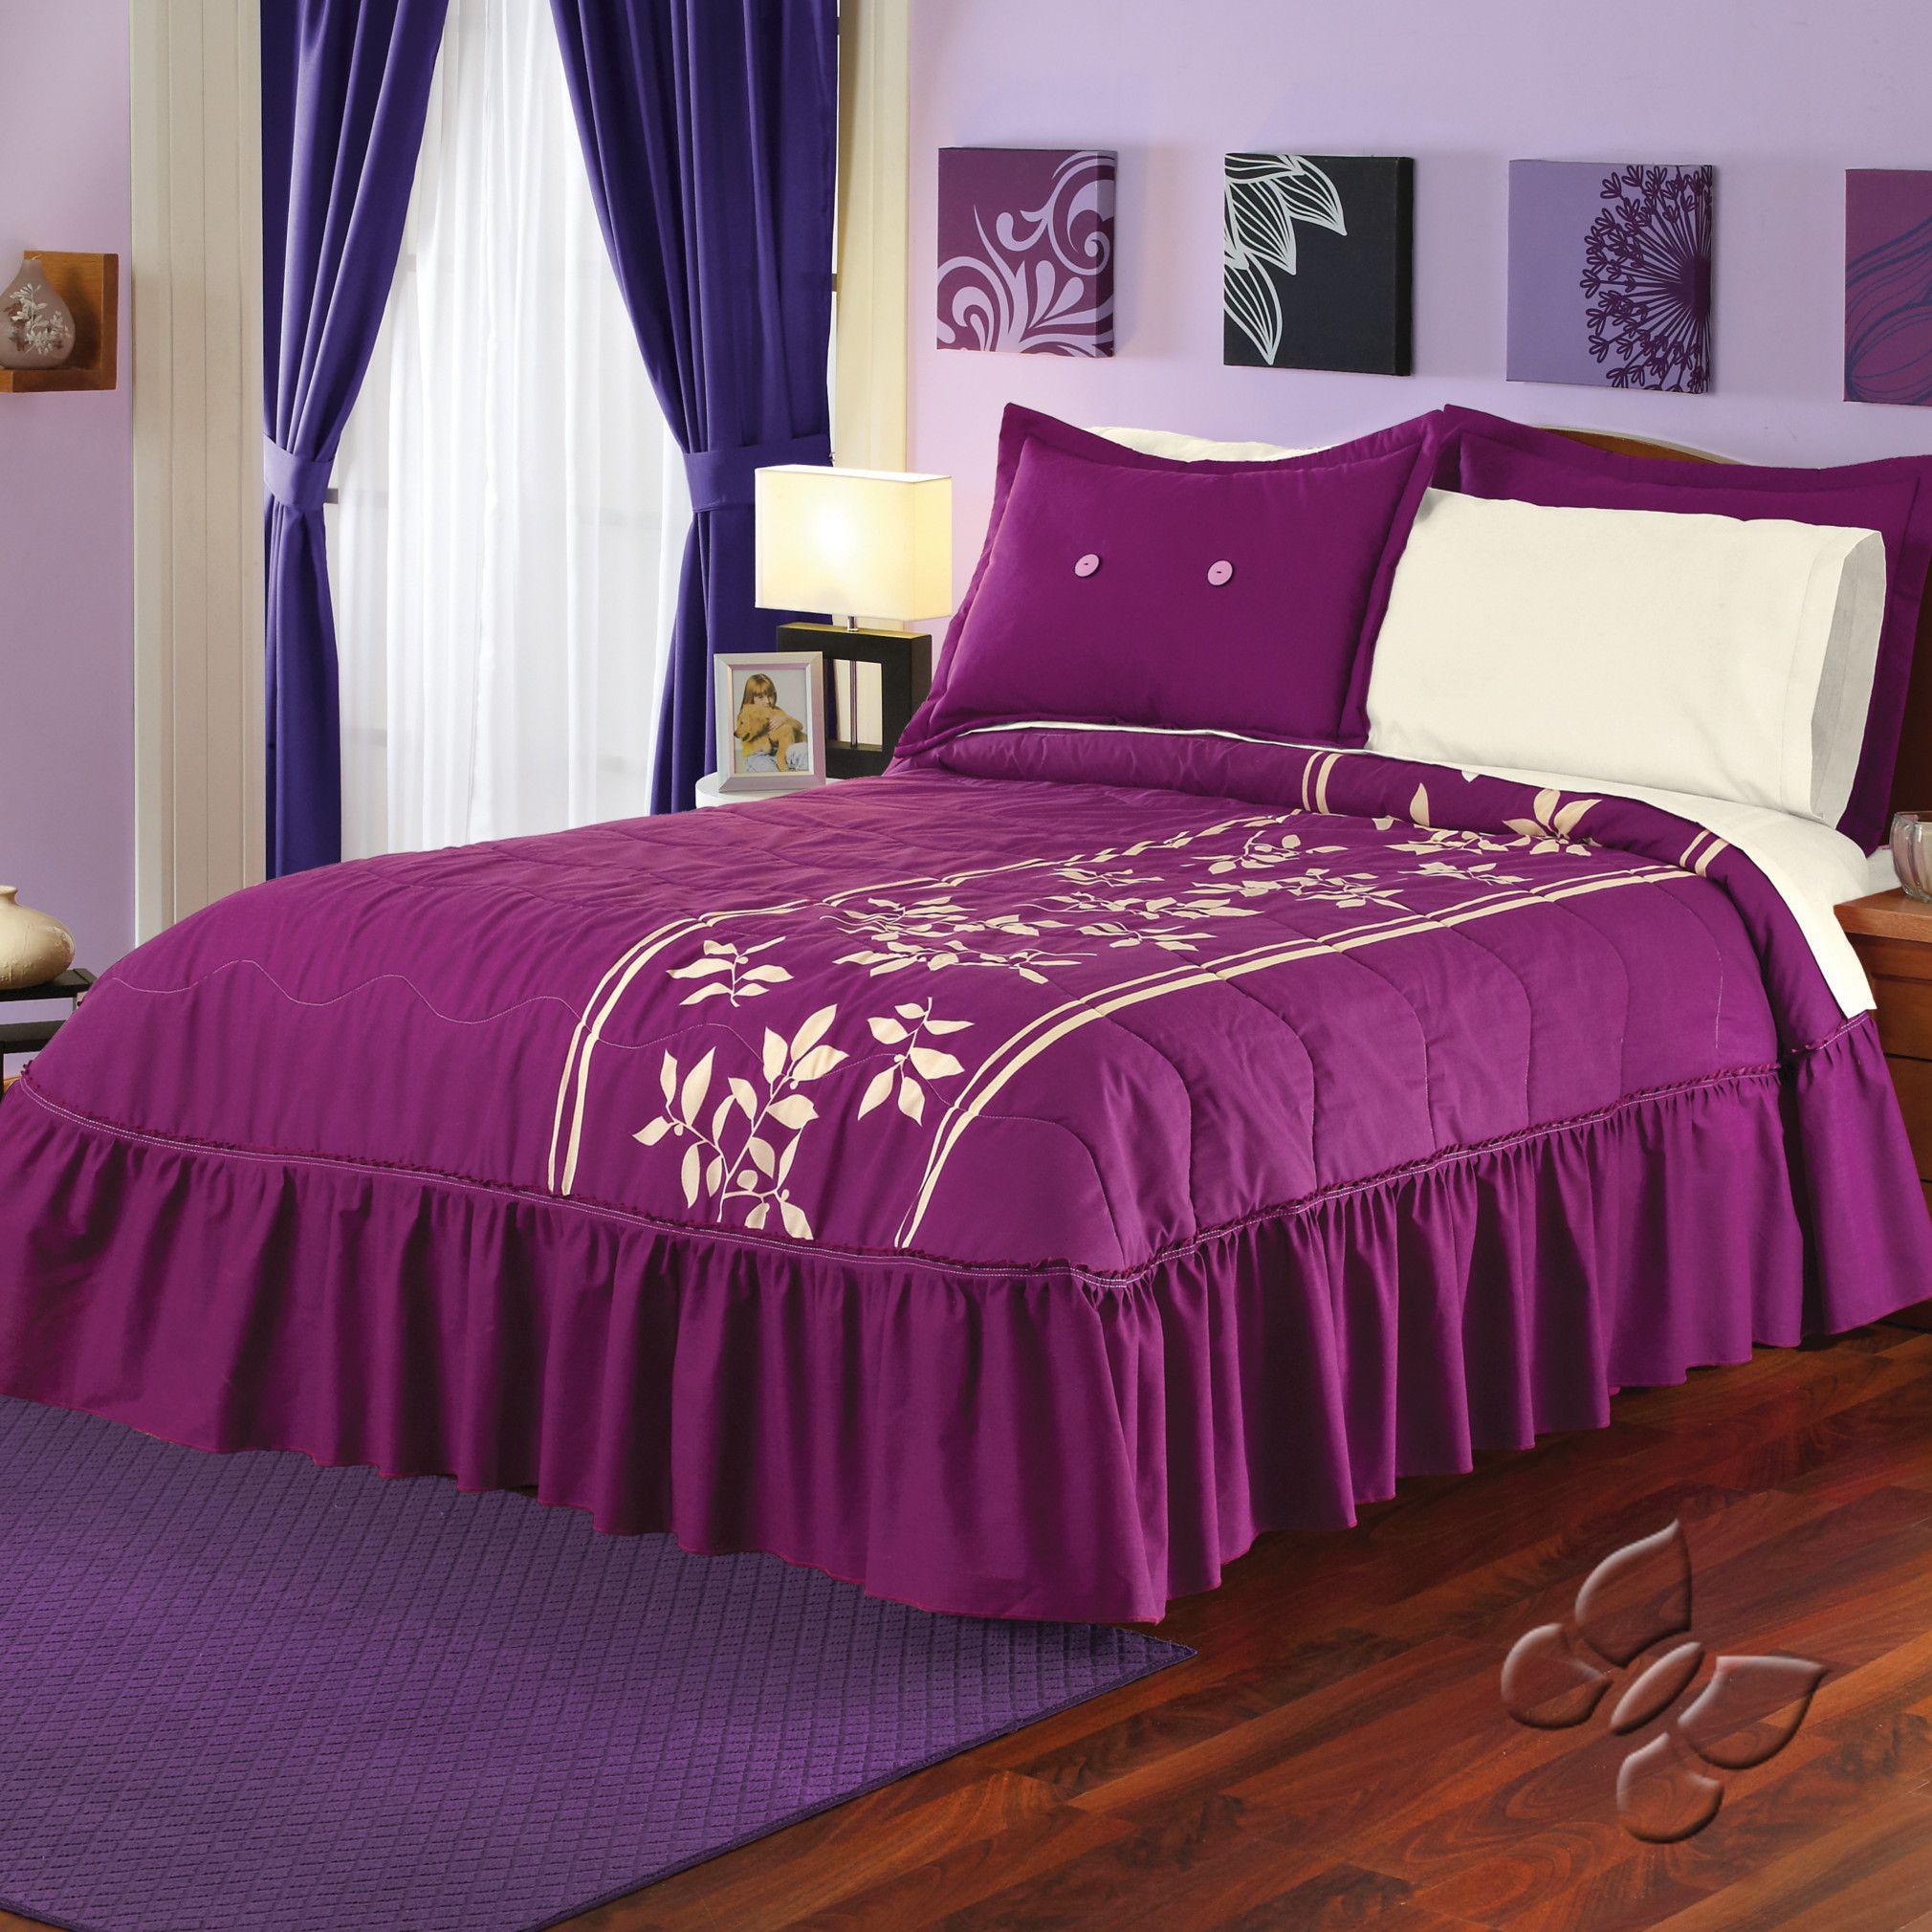 Colcha azalea de intima hogar visita edredones colchas cobertores pinterest - Colchas y edredones ...